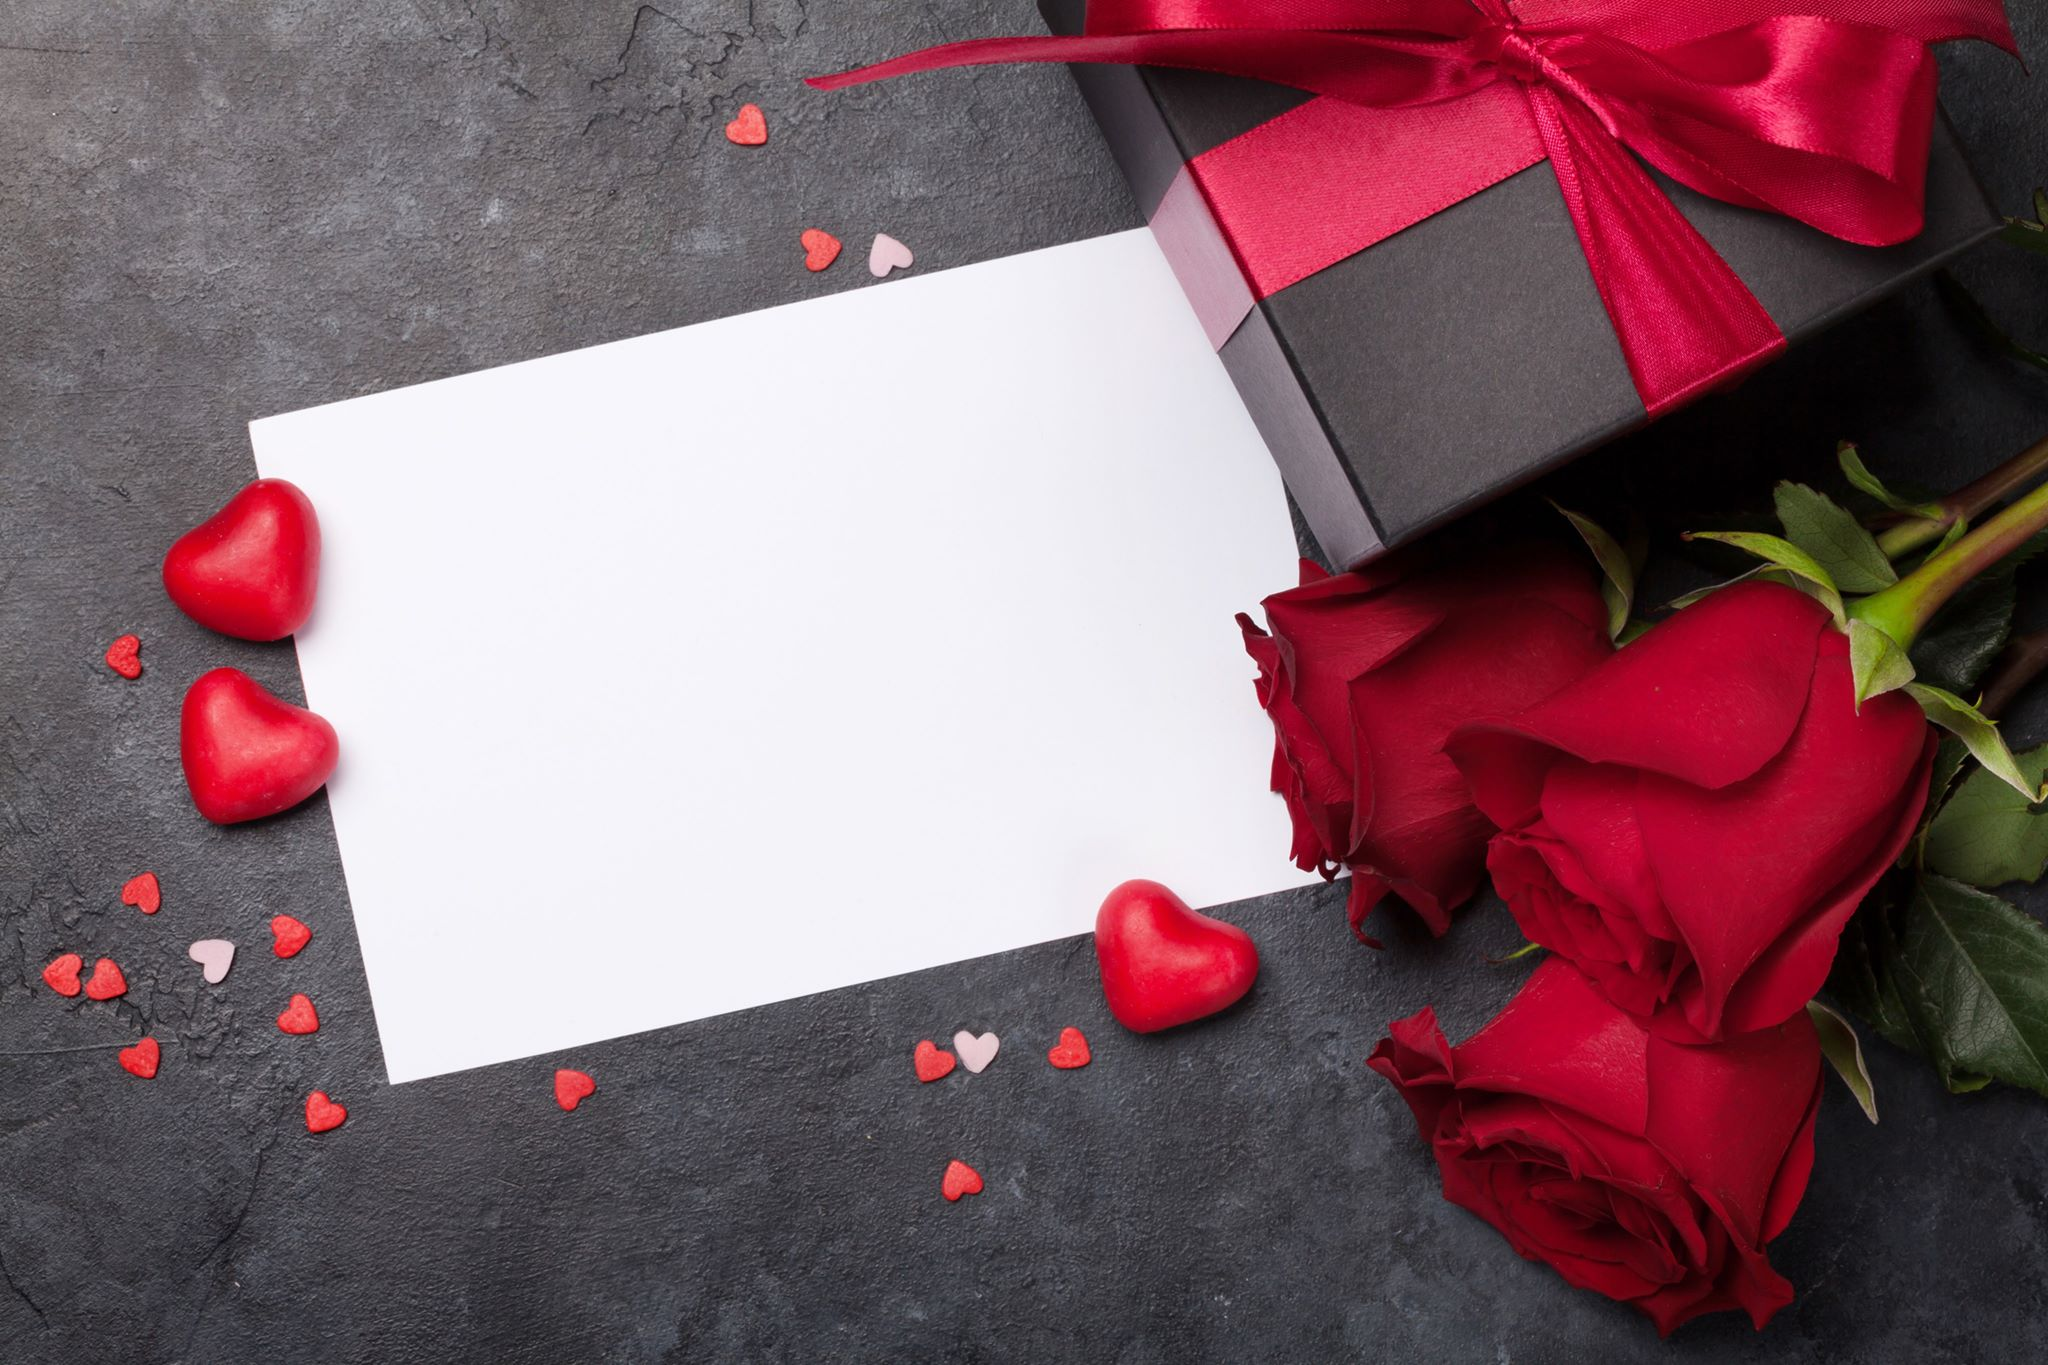 Valentines day images 16 صور عيد الحب